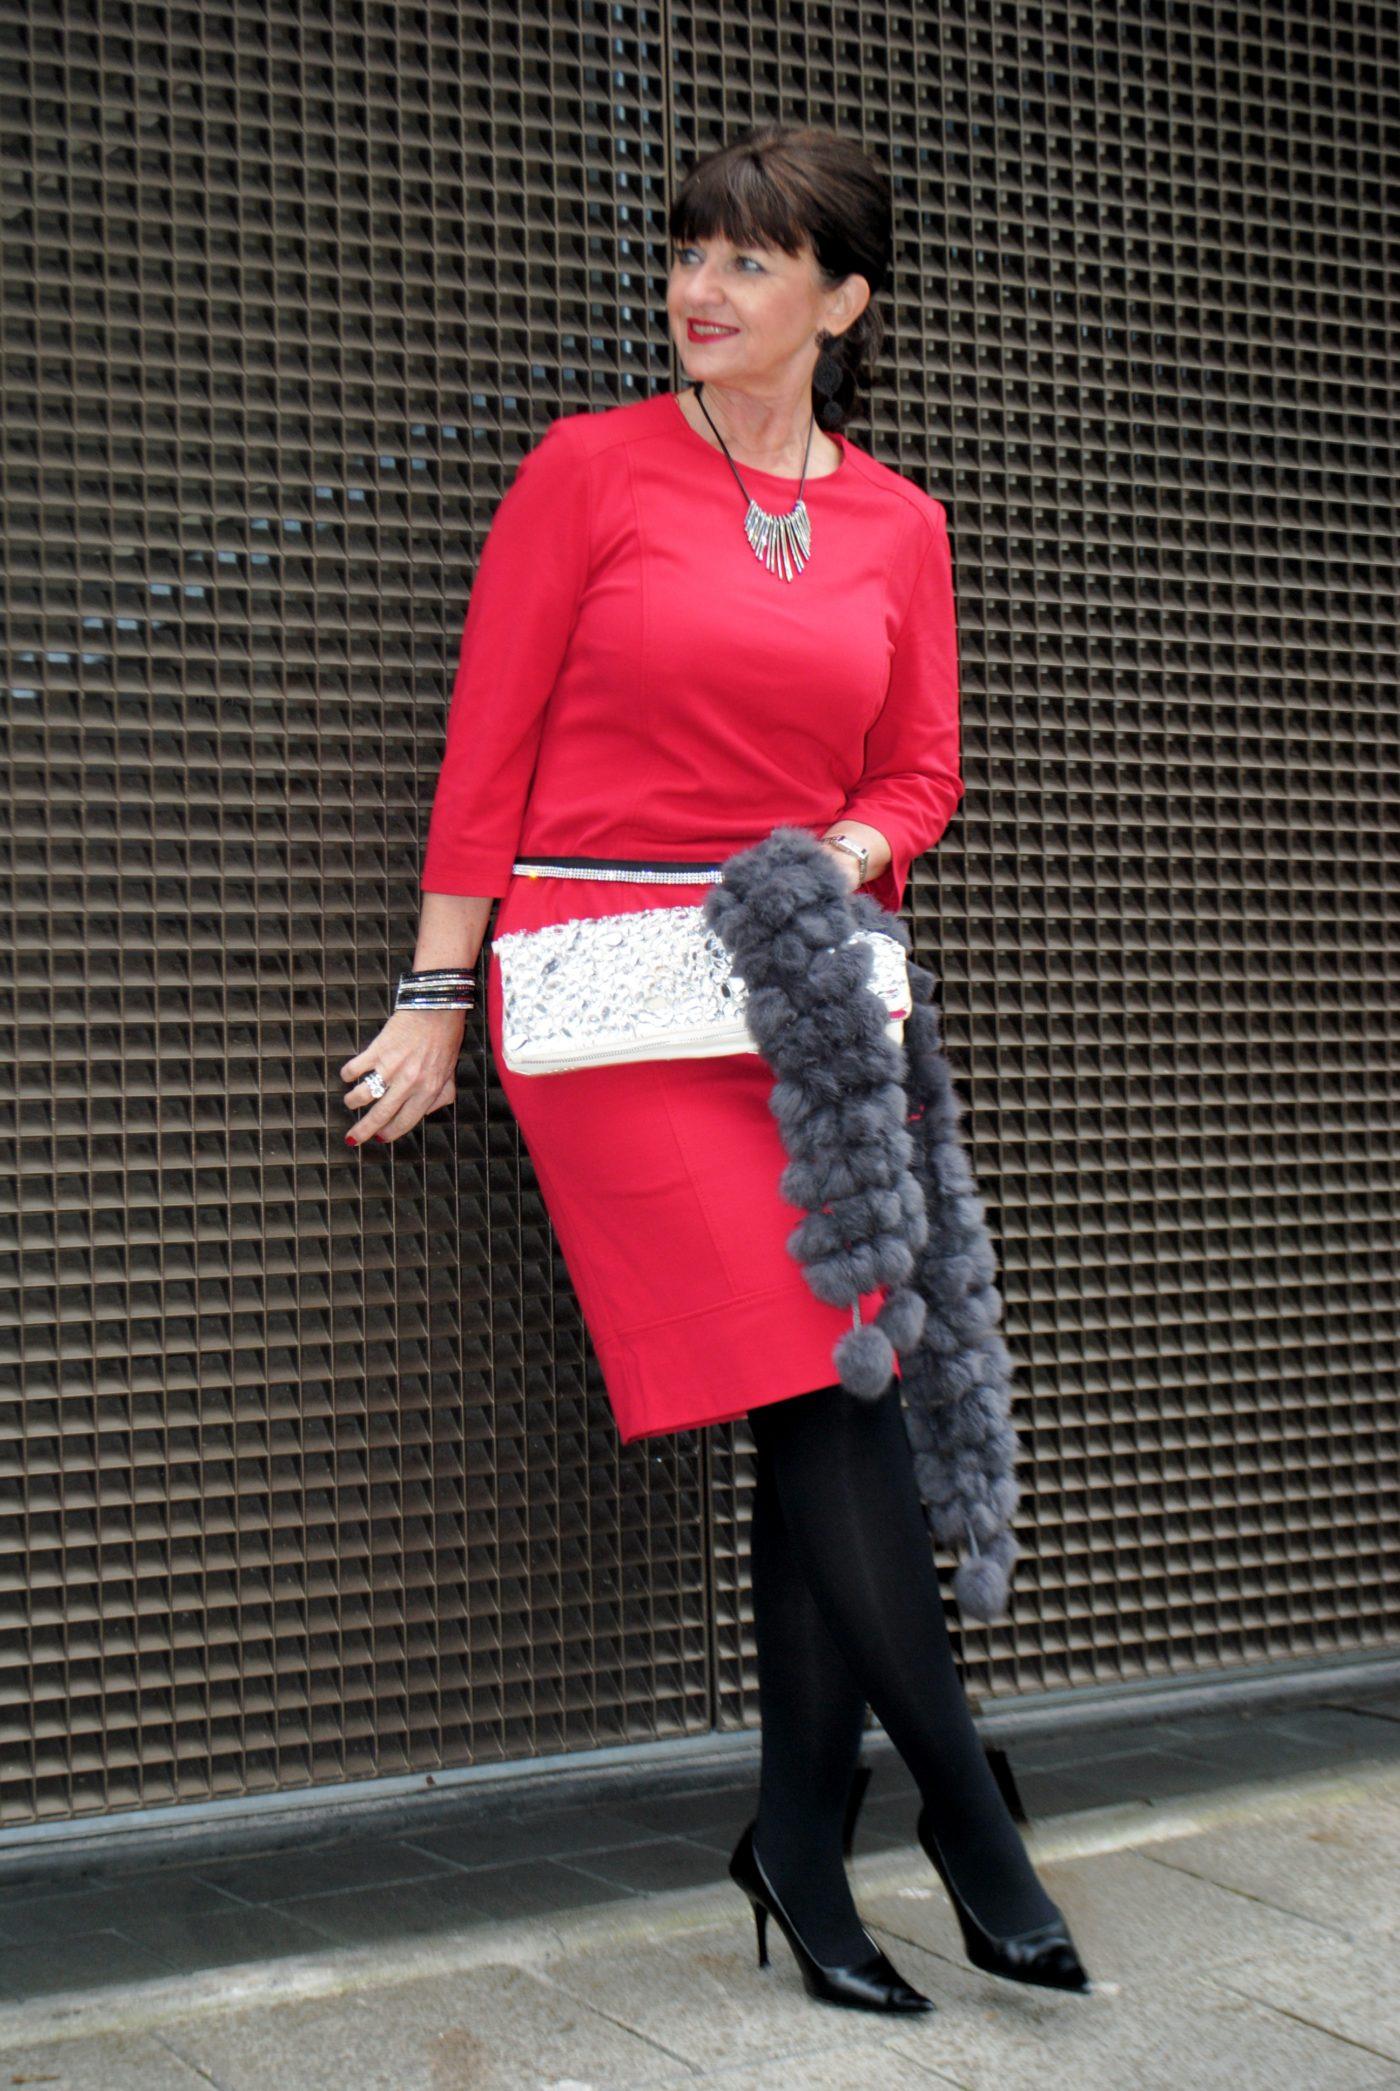 Designer Einzigartig Zalando Rotes Abendkleid Vertrieb15 Schön Zalando Rotes Abendkleid Bester Preis